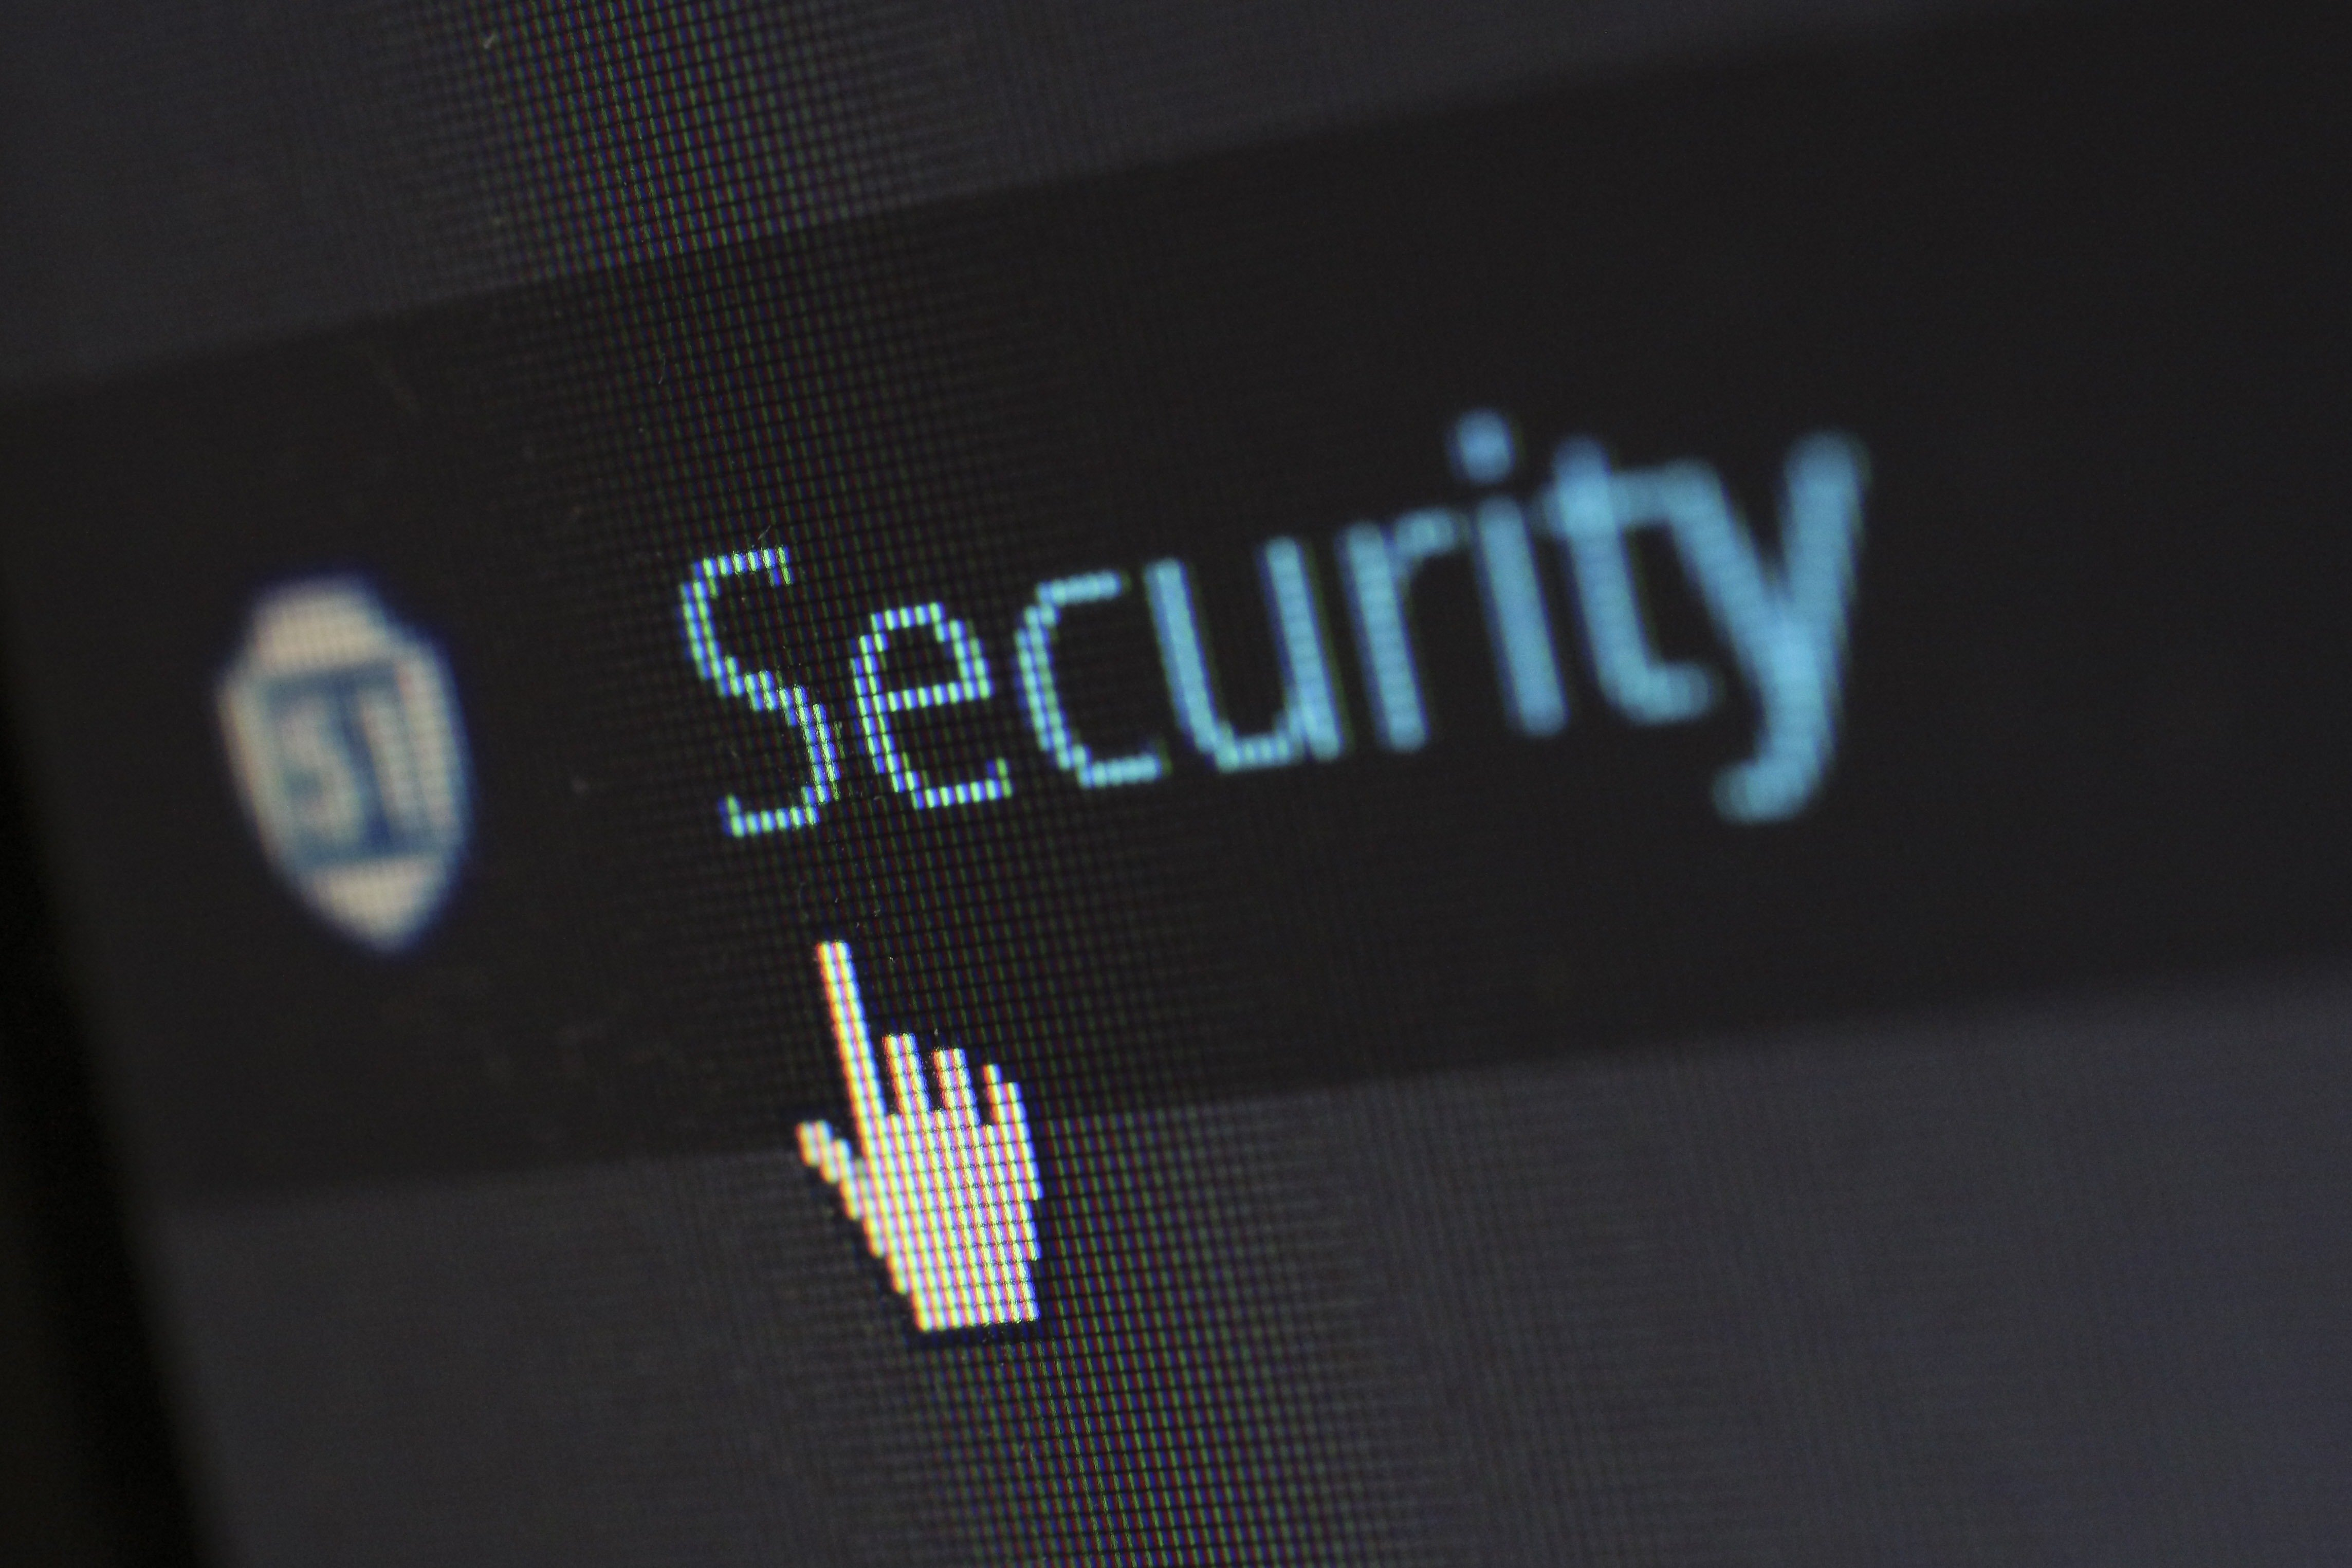 trumpet cybersecurity checklist blog post.jpeg